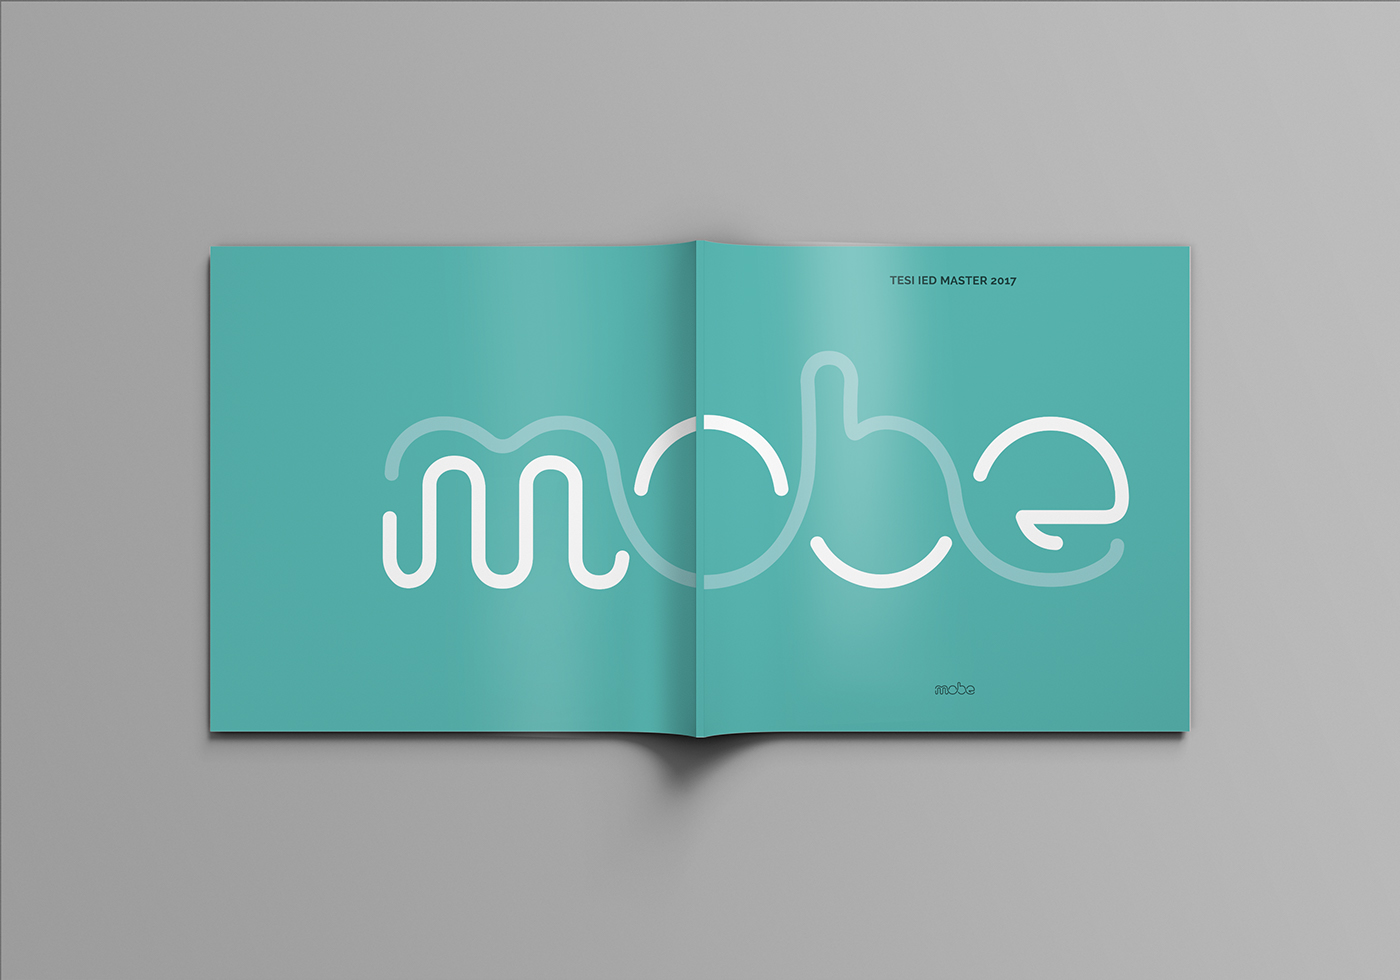 mobile app mobe altroconsu MO UI ux